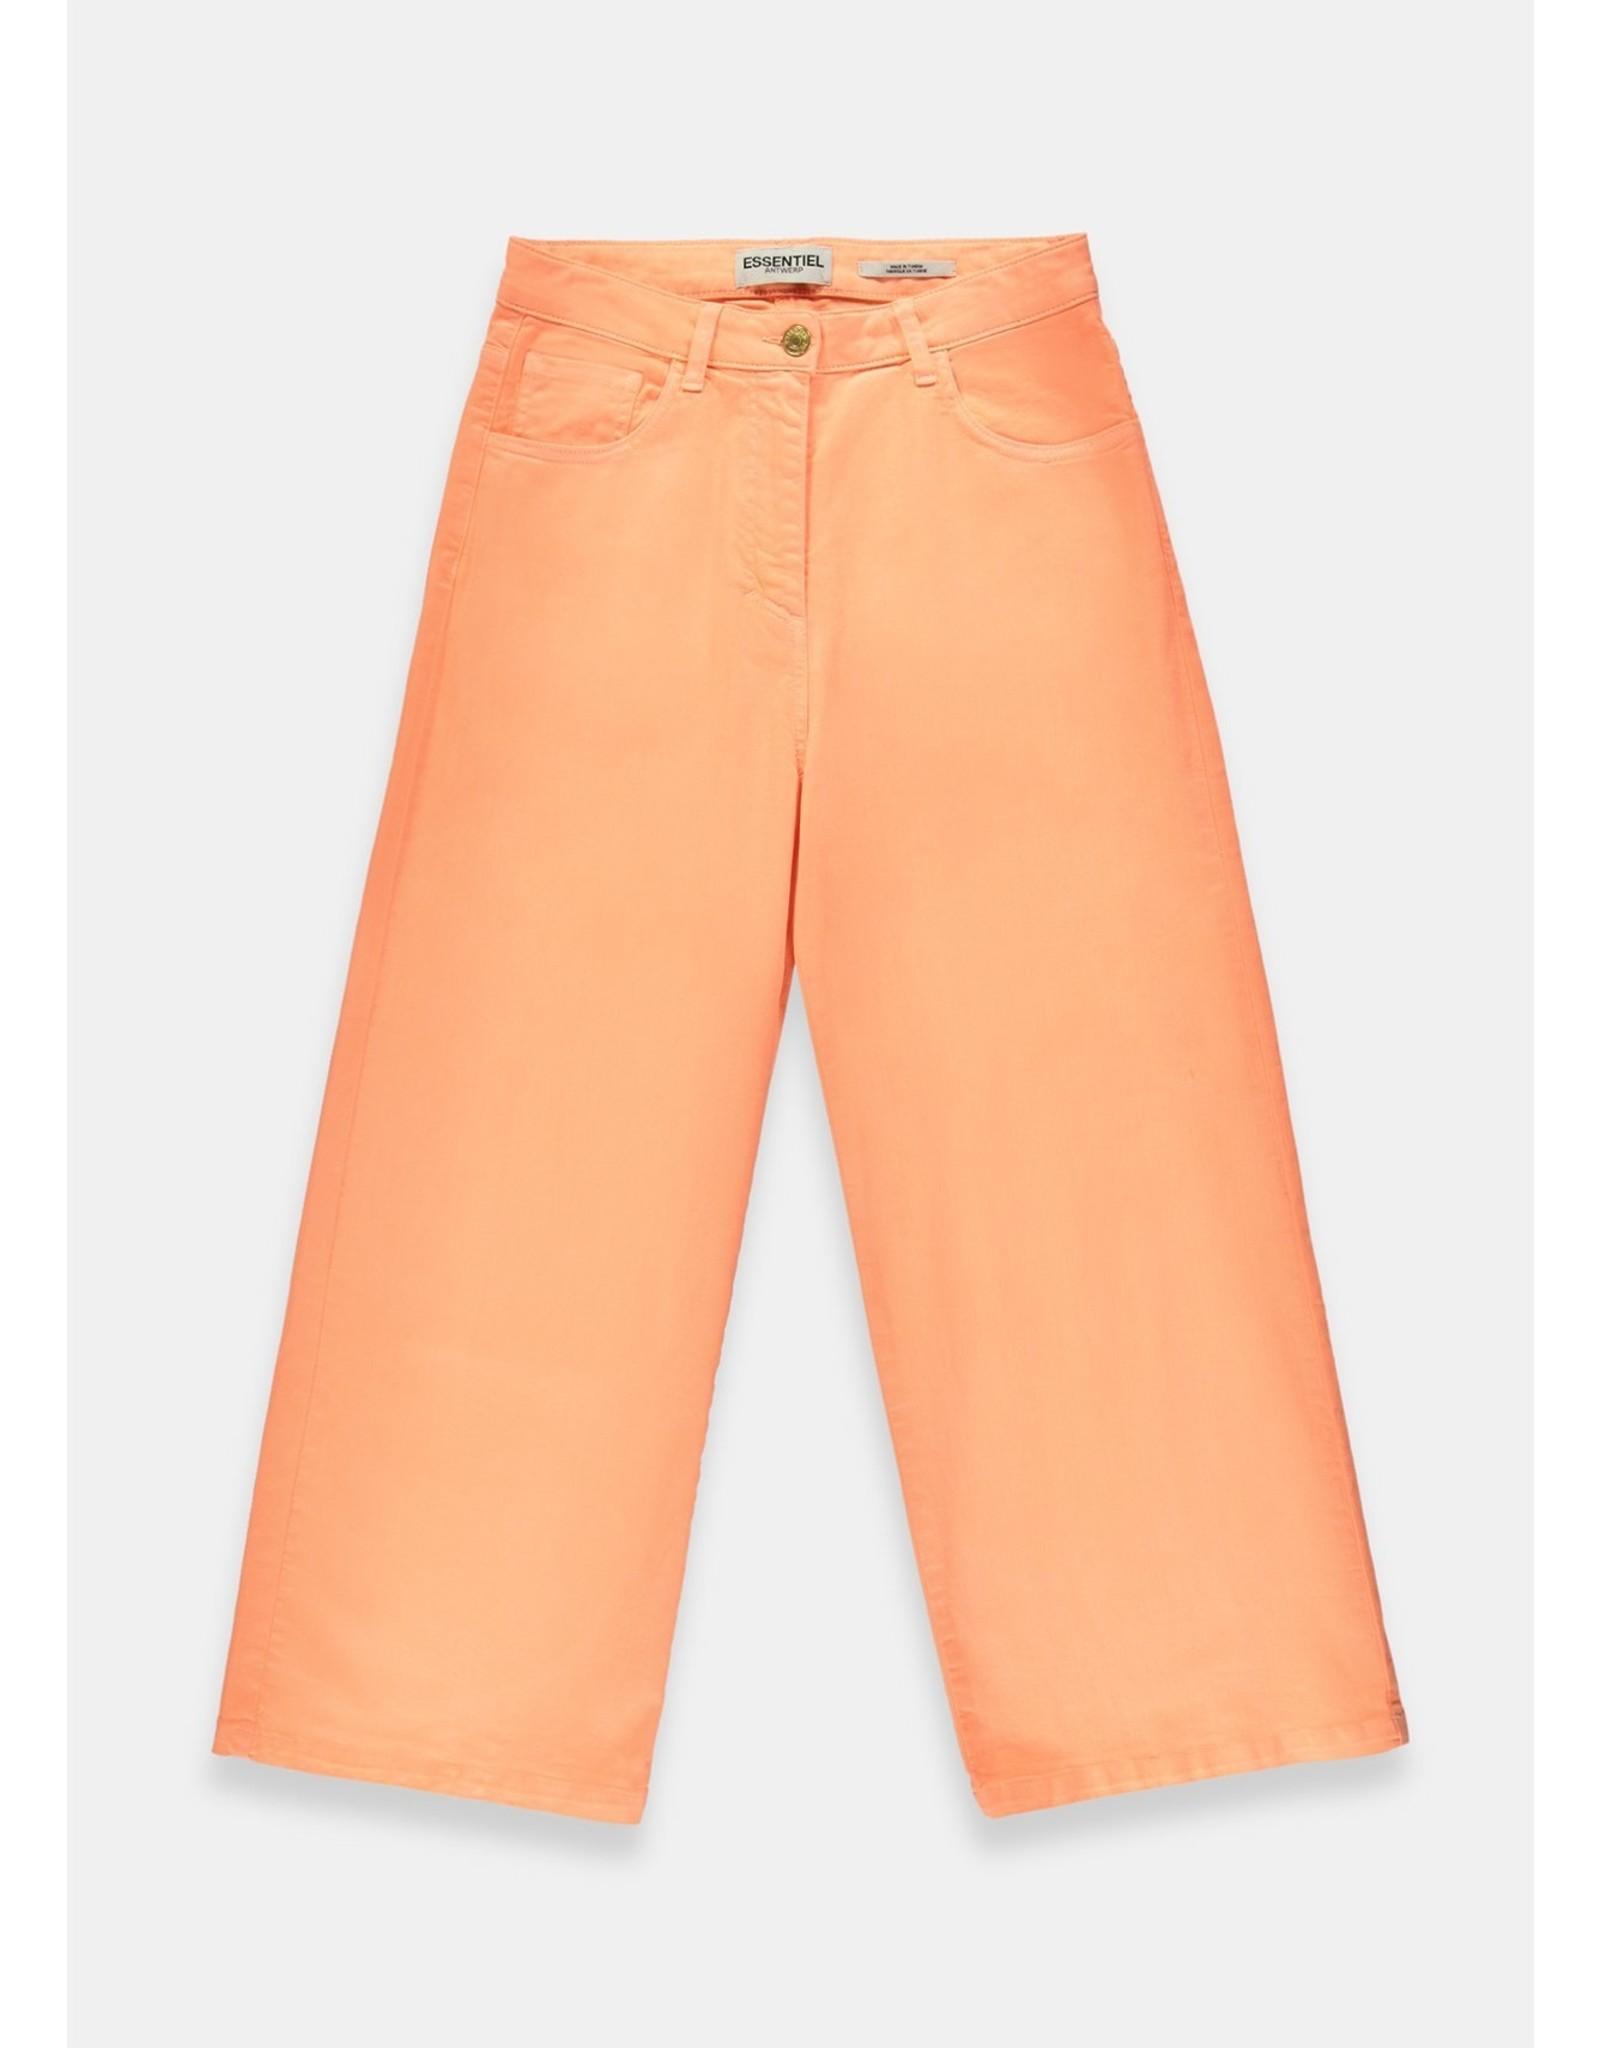 Essentiel Tilburg Crop Jean